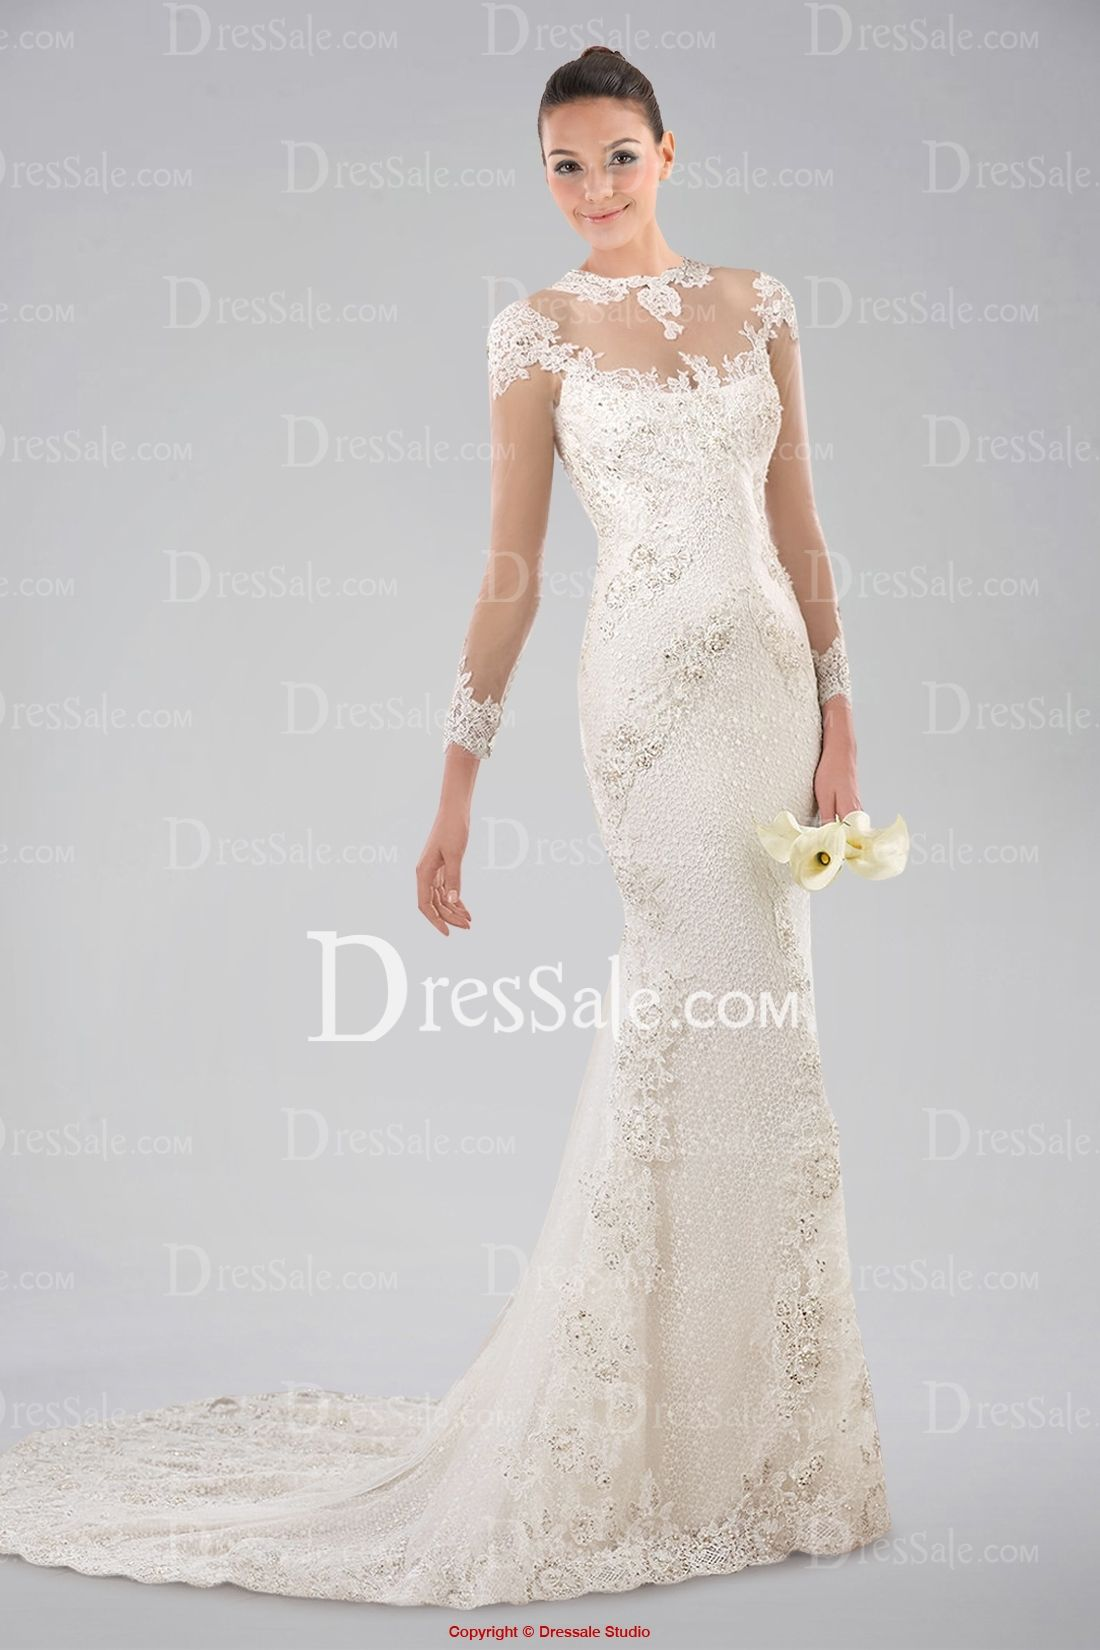 Noble illusion neckline long sleeve wedding dress with lace overlay